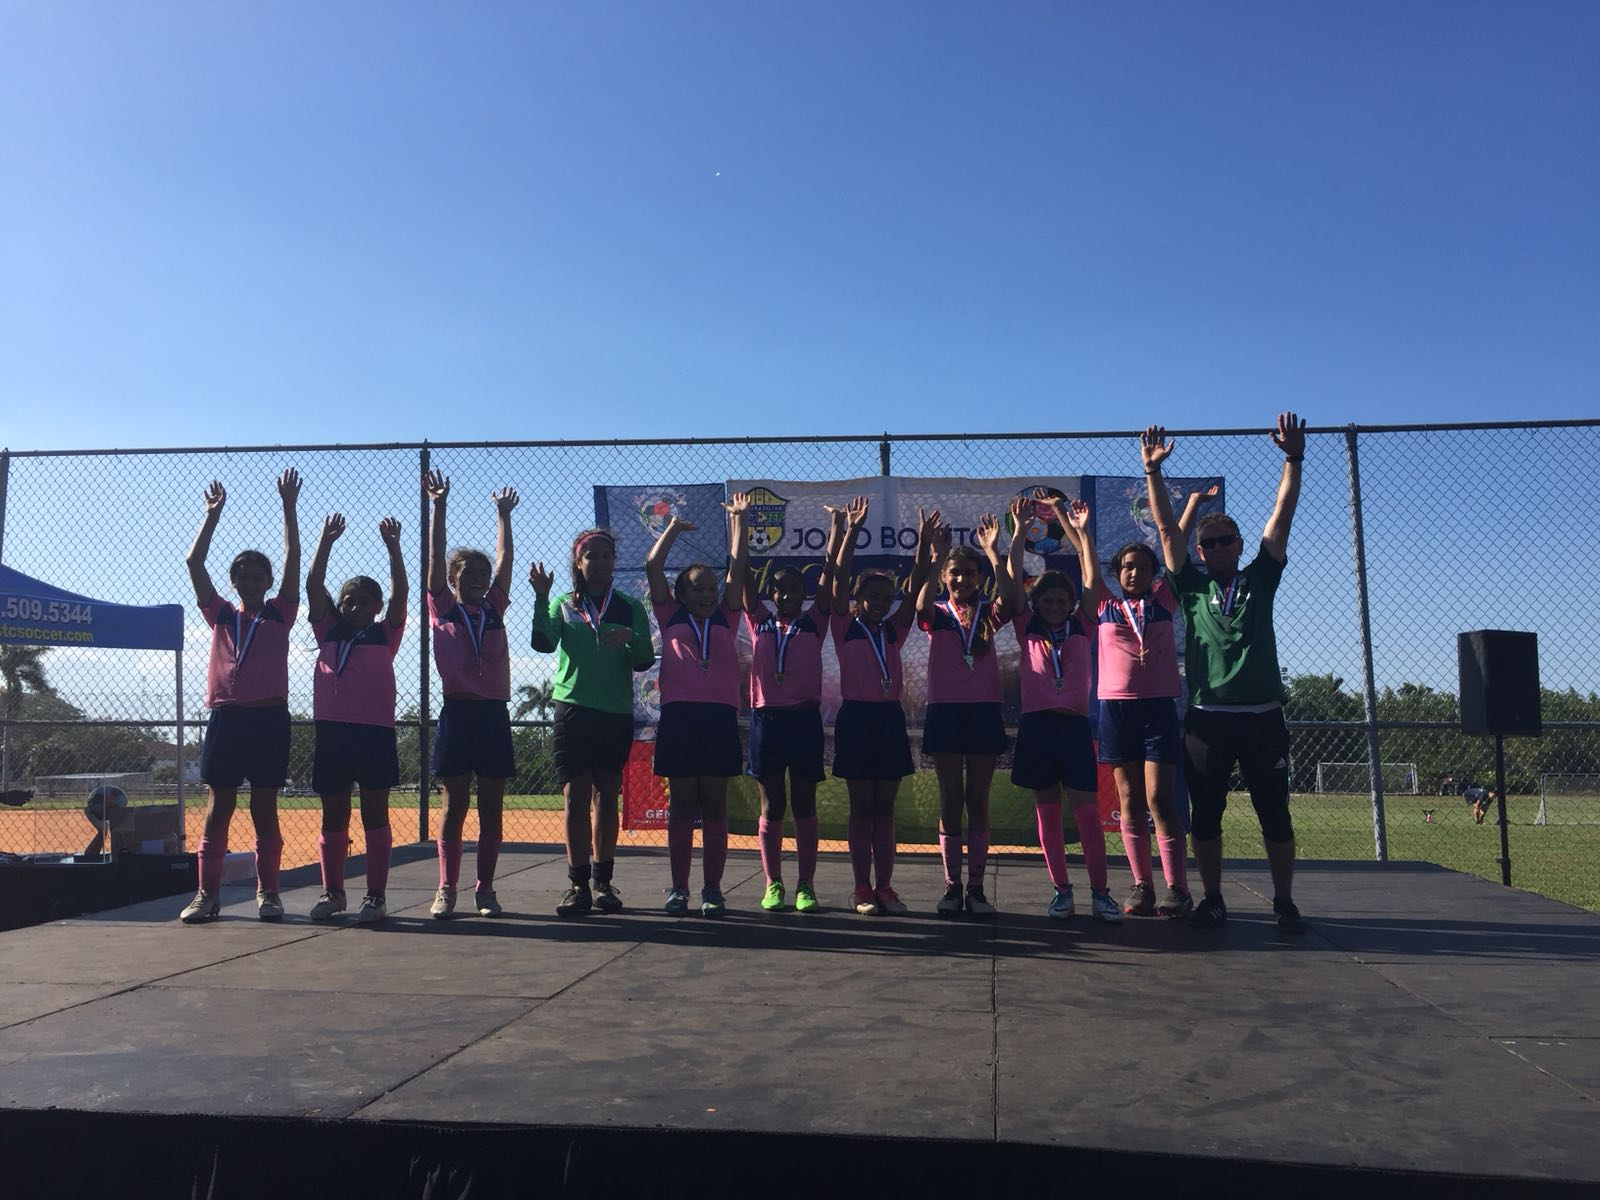 Jogo Bonito Champions U12 Girls